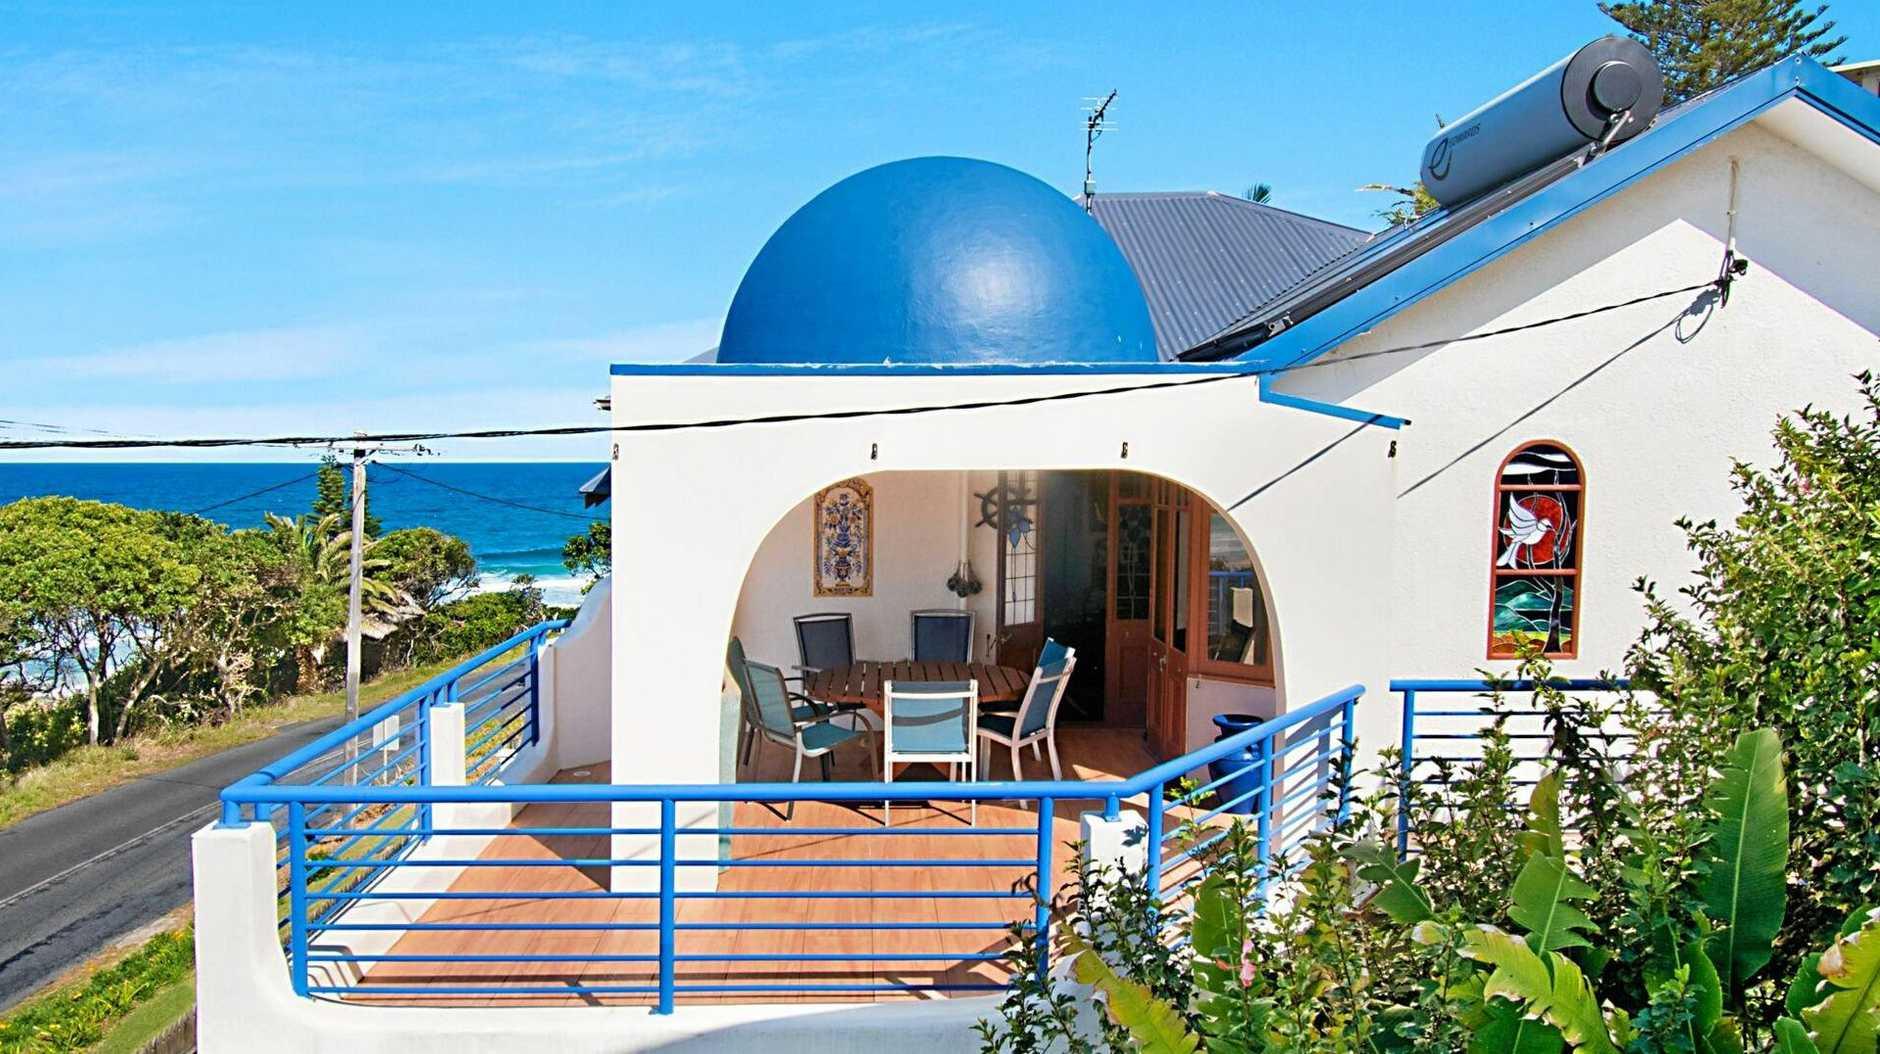 Ballina beachside property known as 'Mykonos' at 25 Suvla Street, East Ballina is on the market.